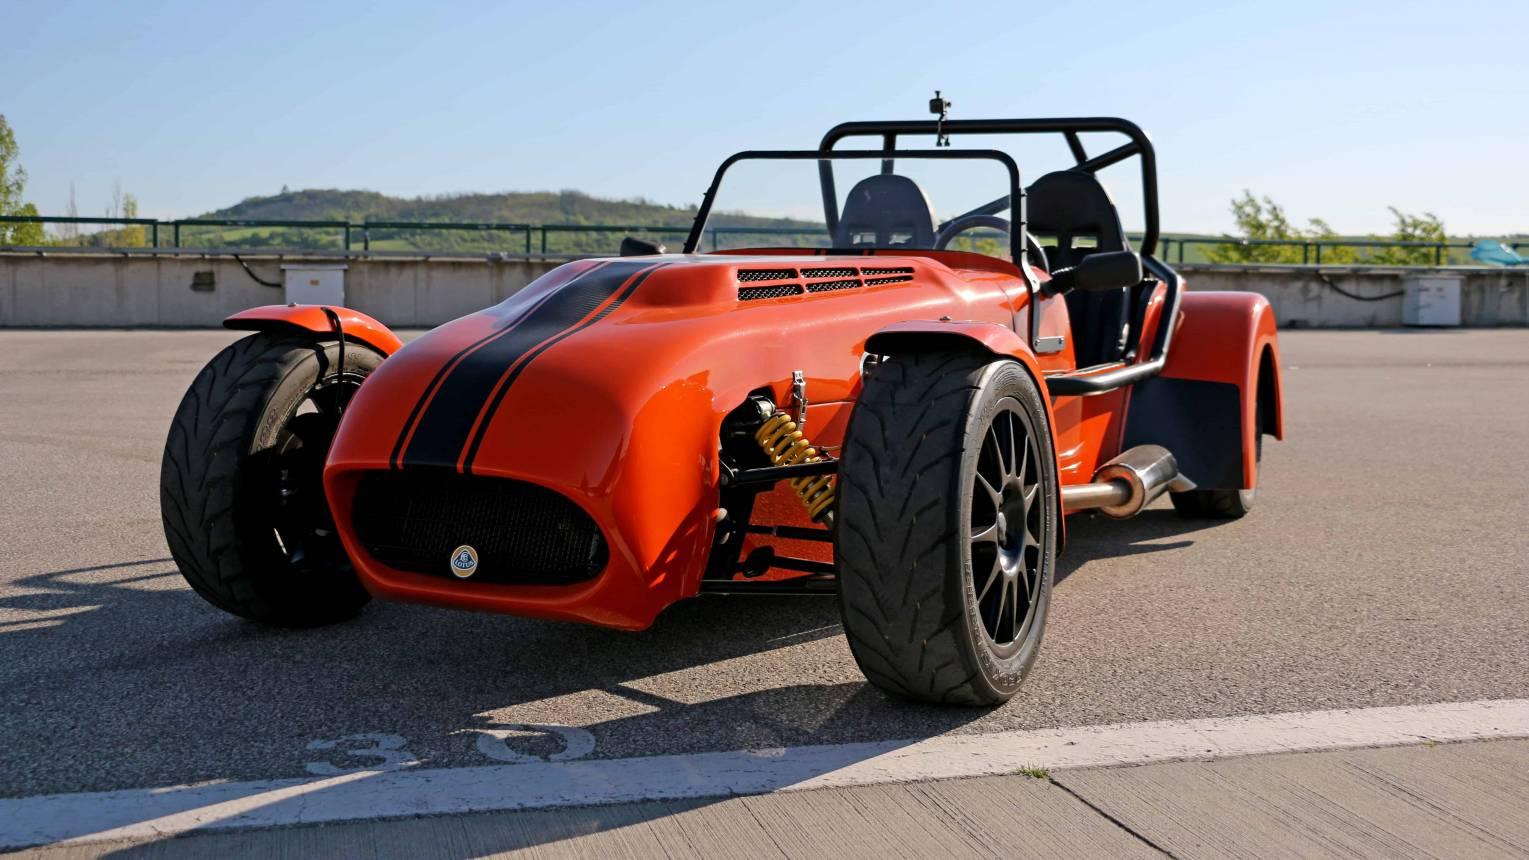 Lotus Super Seven vezetés a Hungaroringen